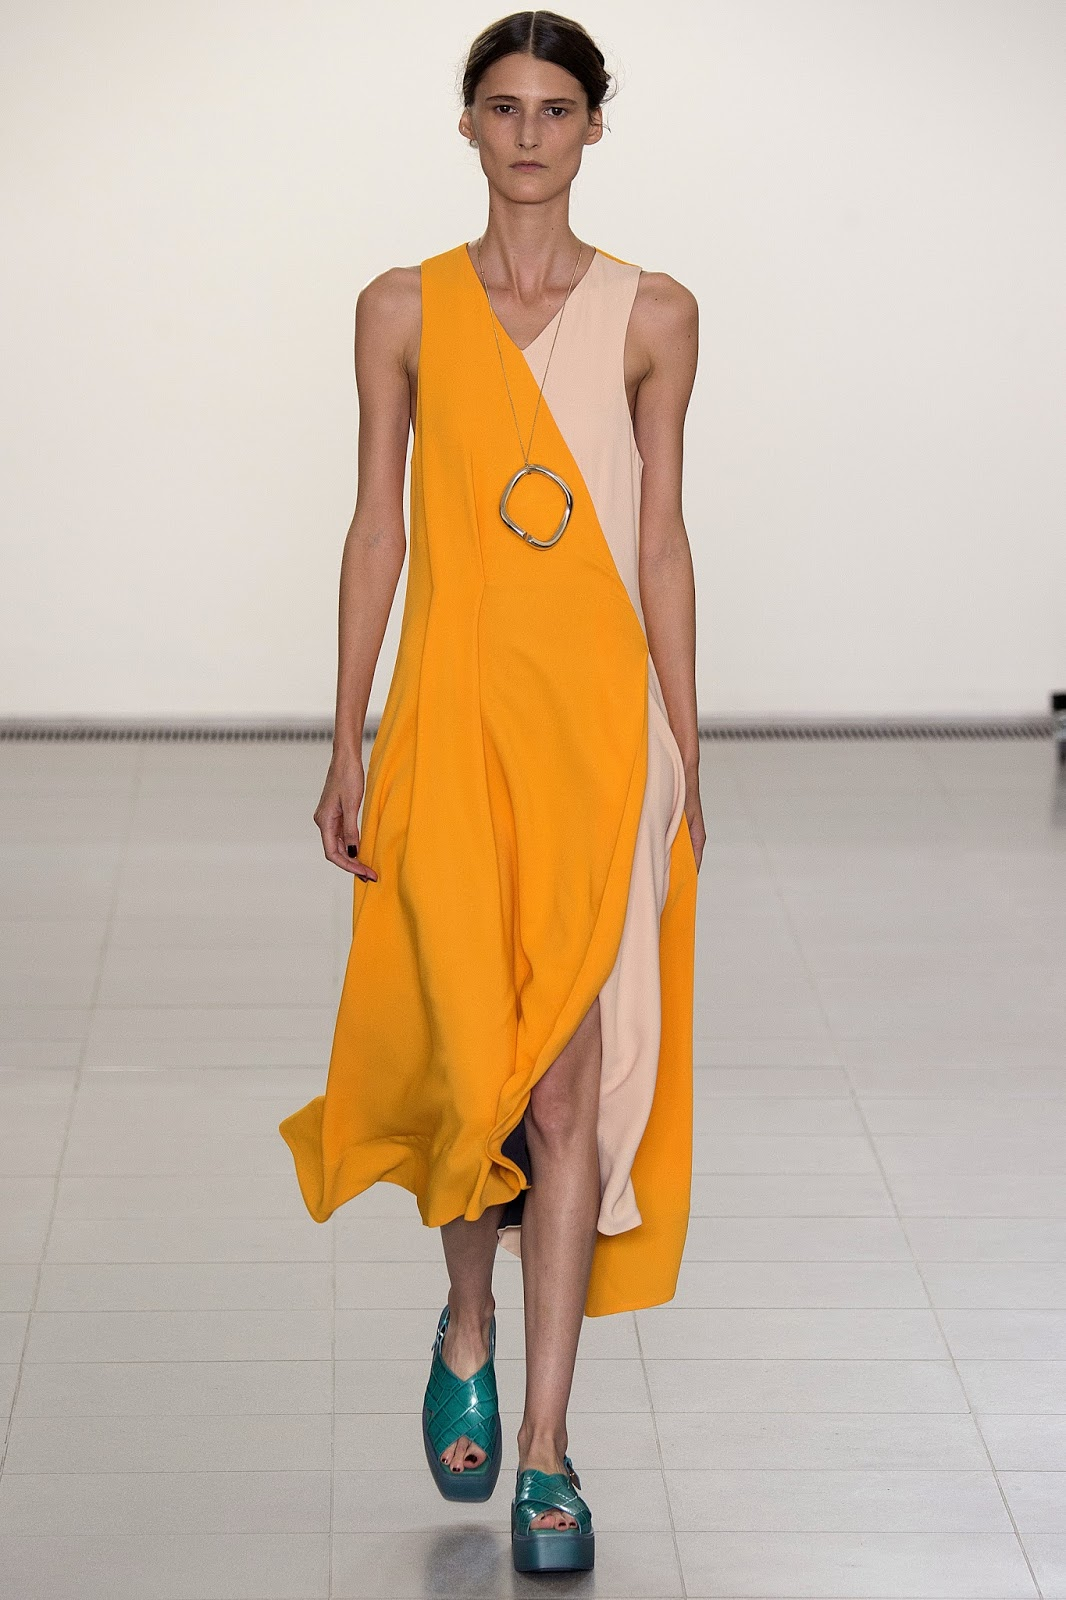 Paul Smith Spring/Summer 2016 / London fashion week via www.fashionedbylove.co.uk